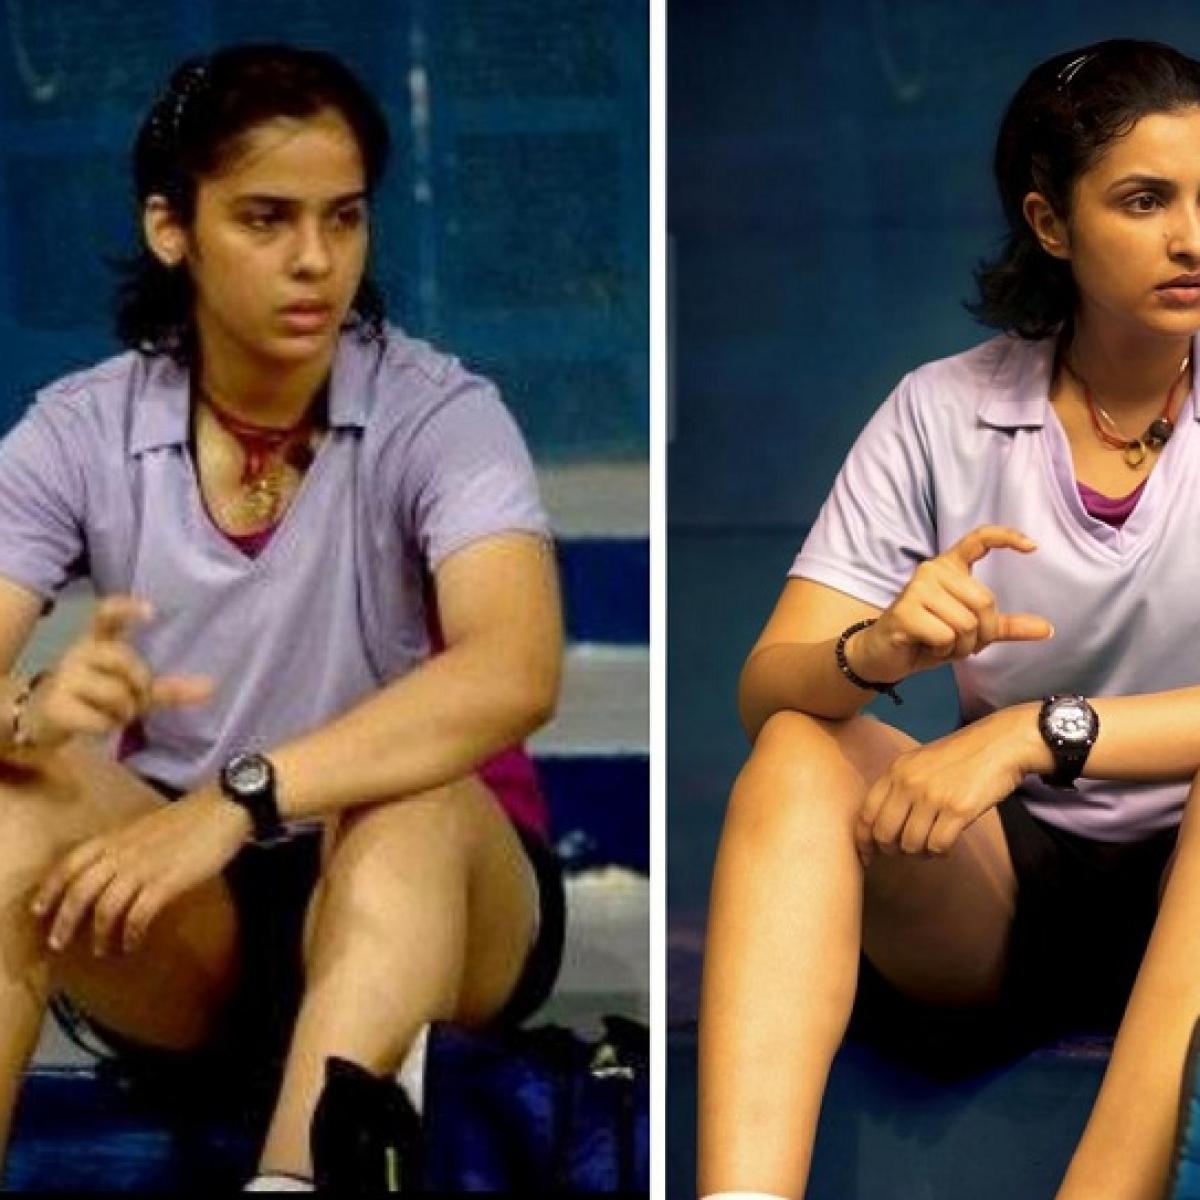 Parineeti Chopra and Saina Nehwal: The uncanny resemblance